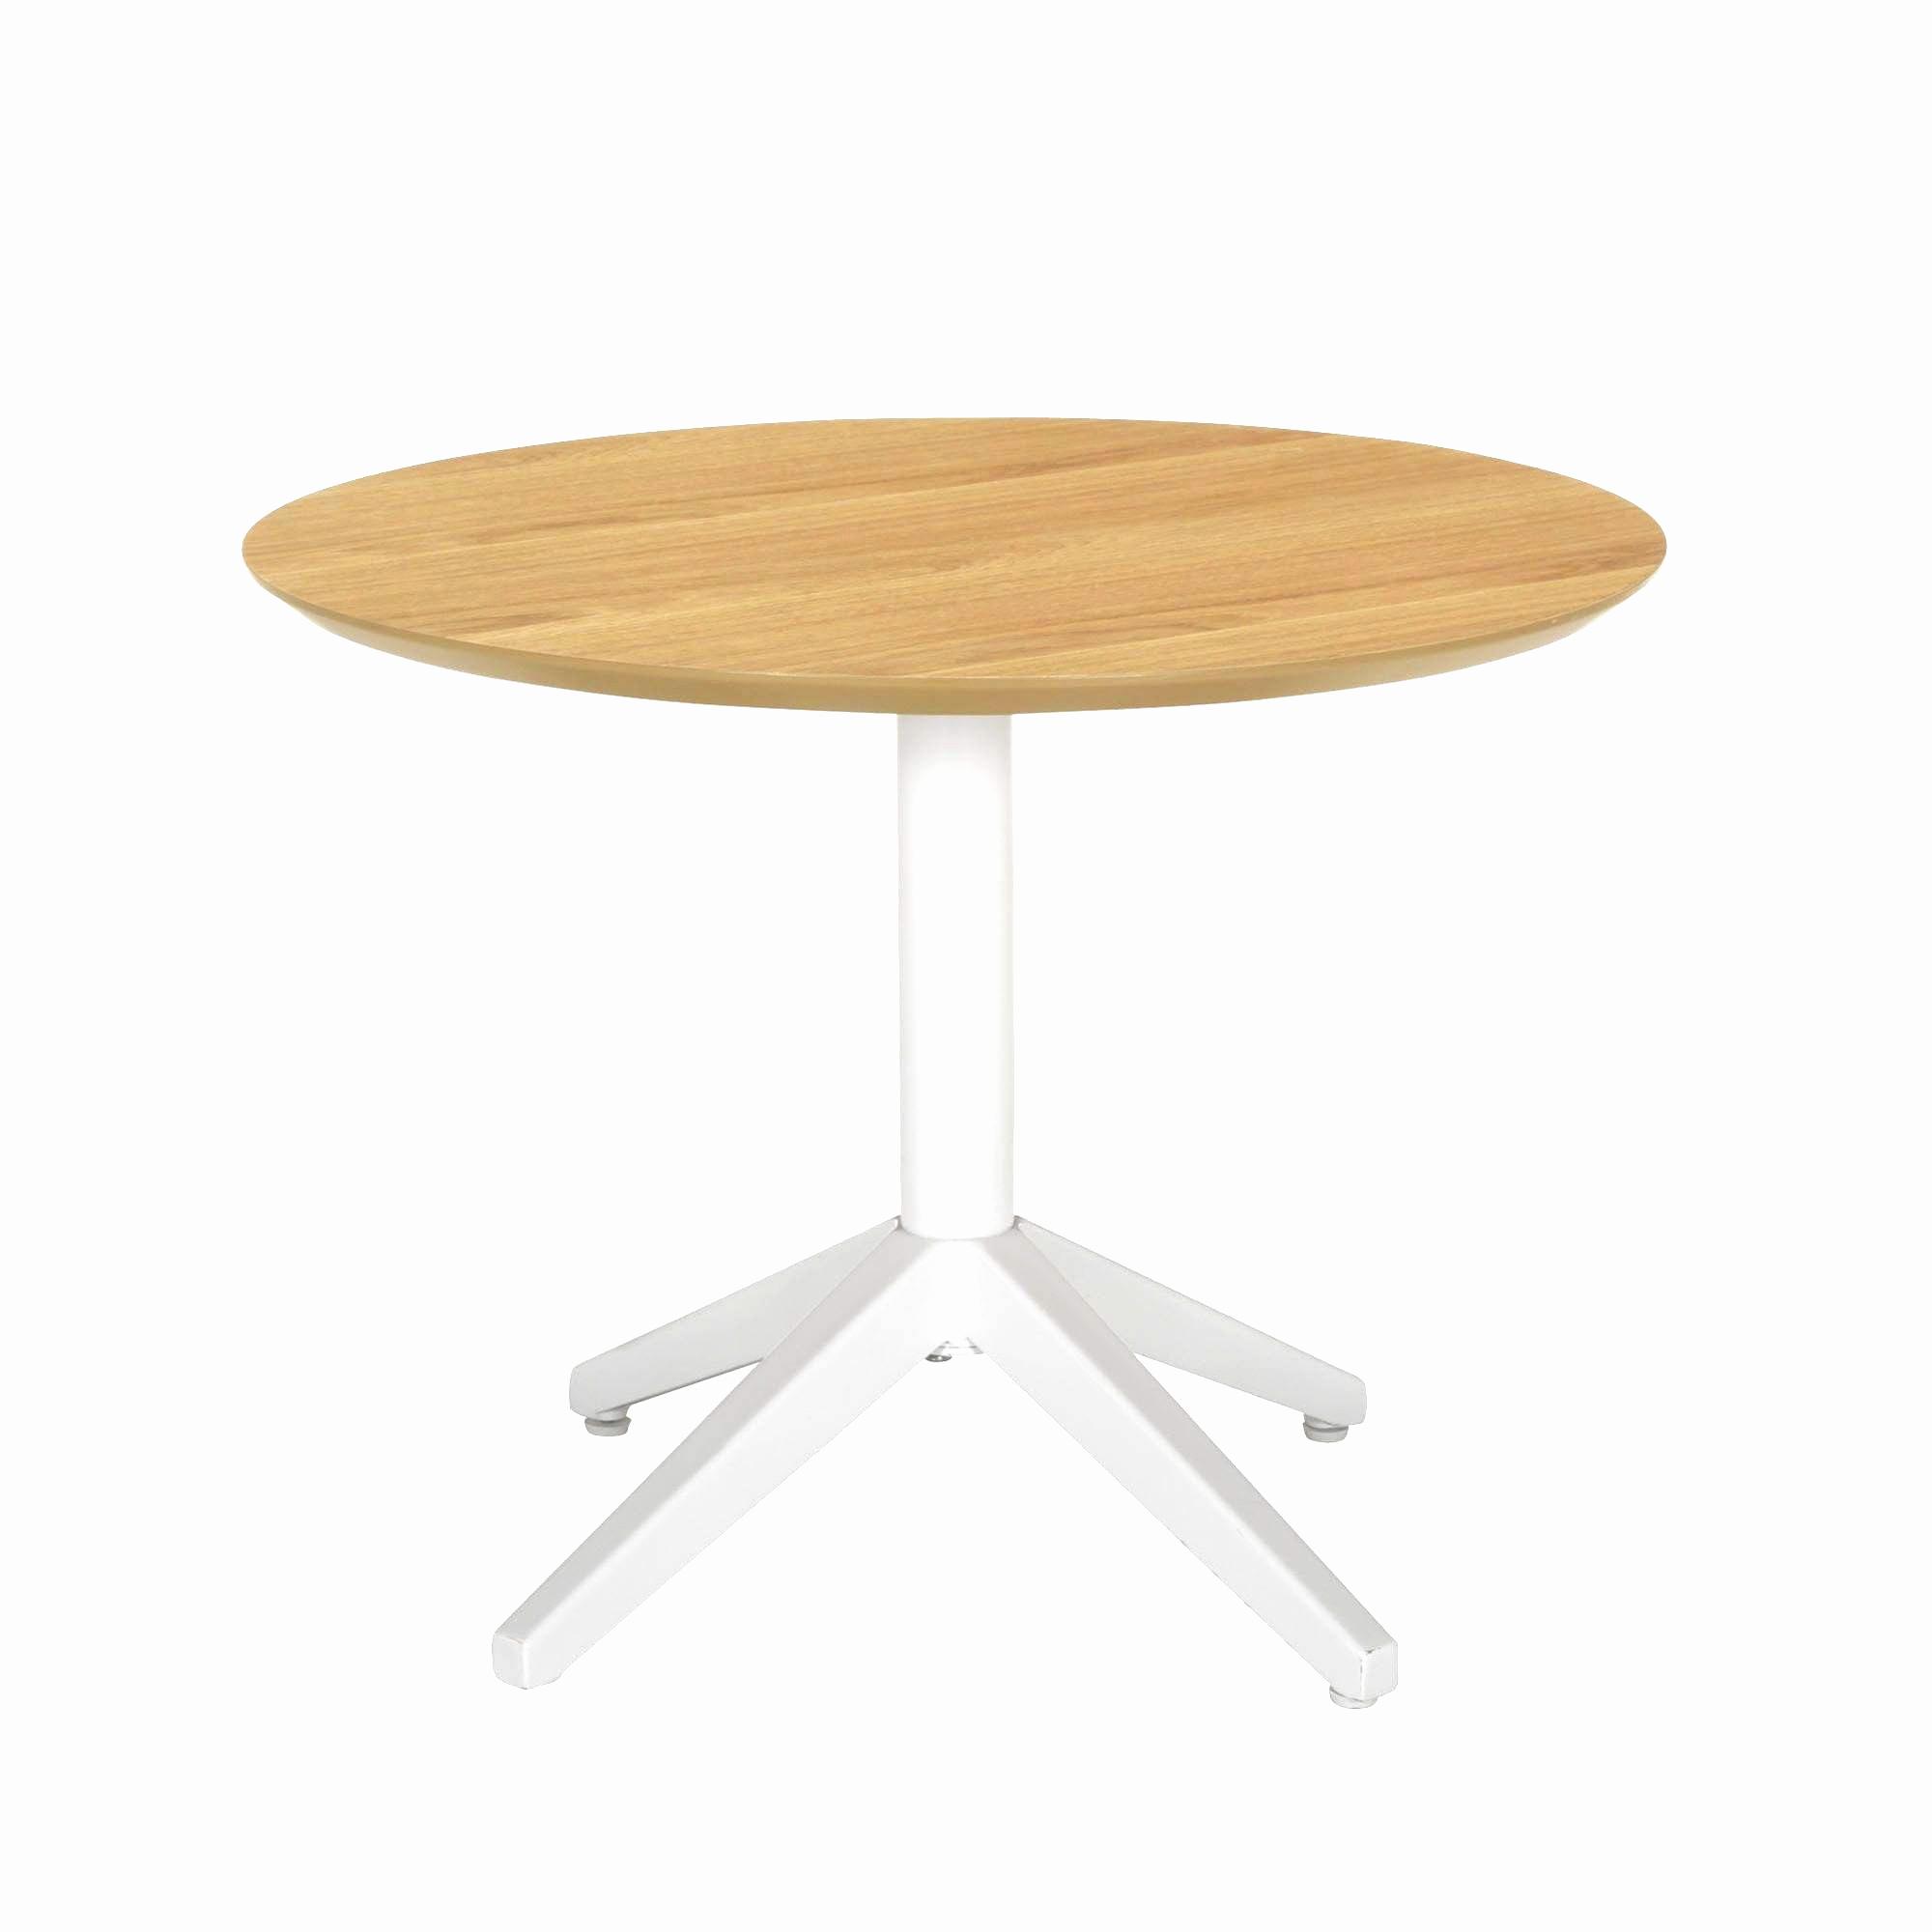 table aluminium pliante impressionnant attrayant salon repas jardin avec chaise pliante hesperide chaise of table aluminium pliante